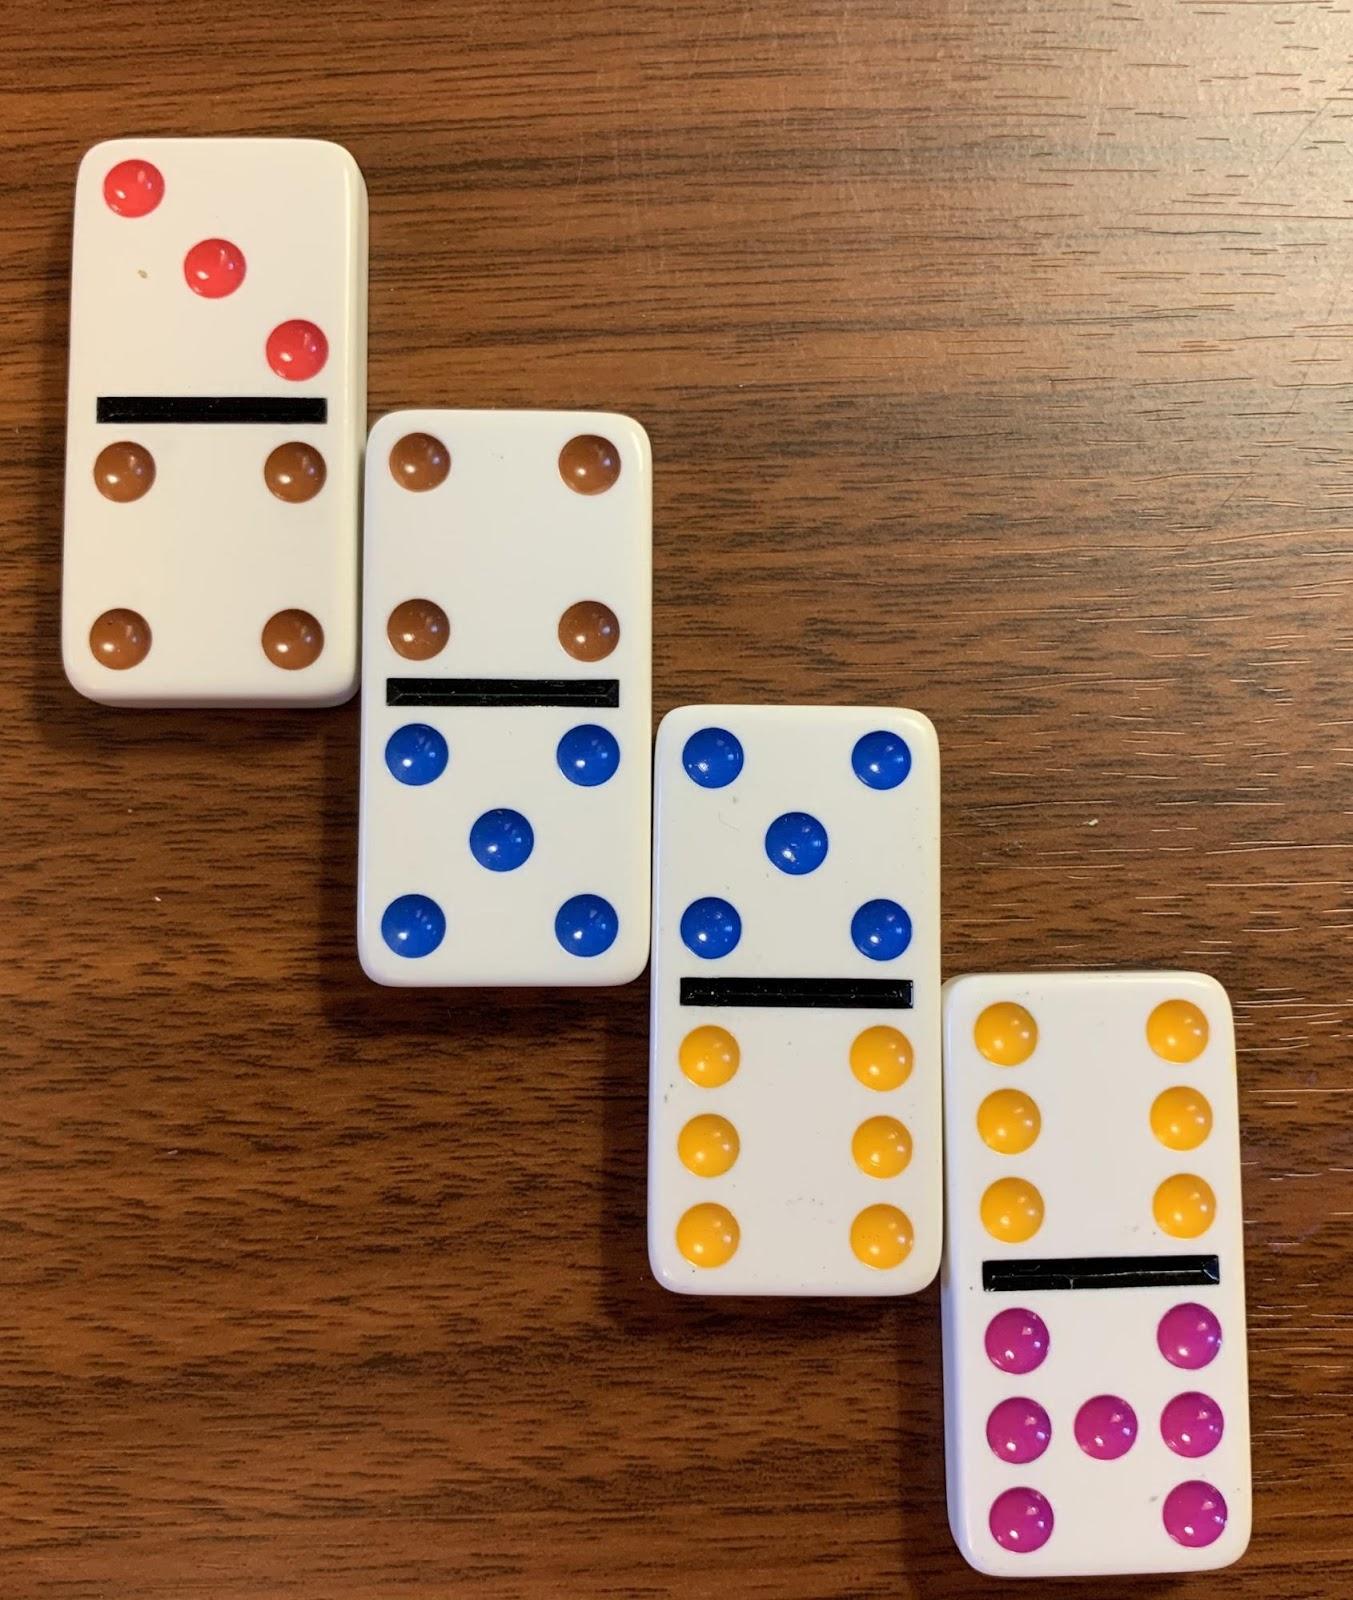 Game LUXY Domino & Poker Yang Wajib Kamu Coba!